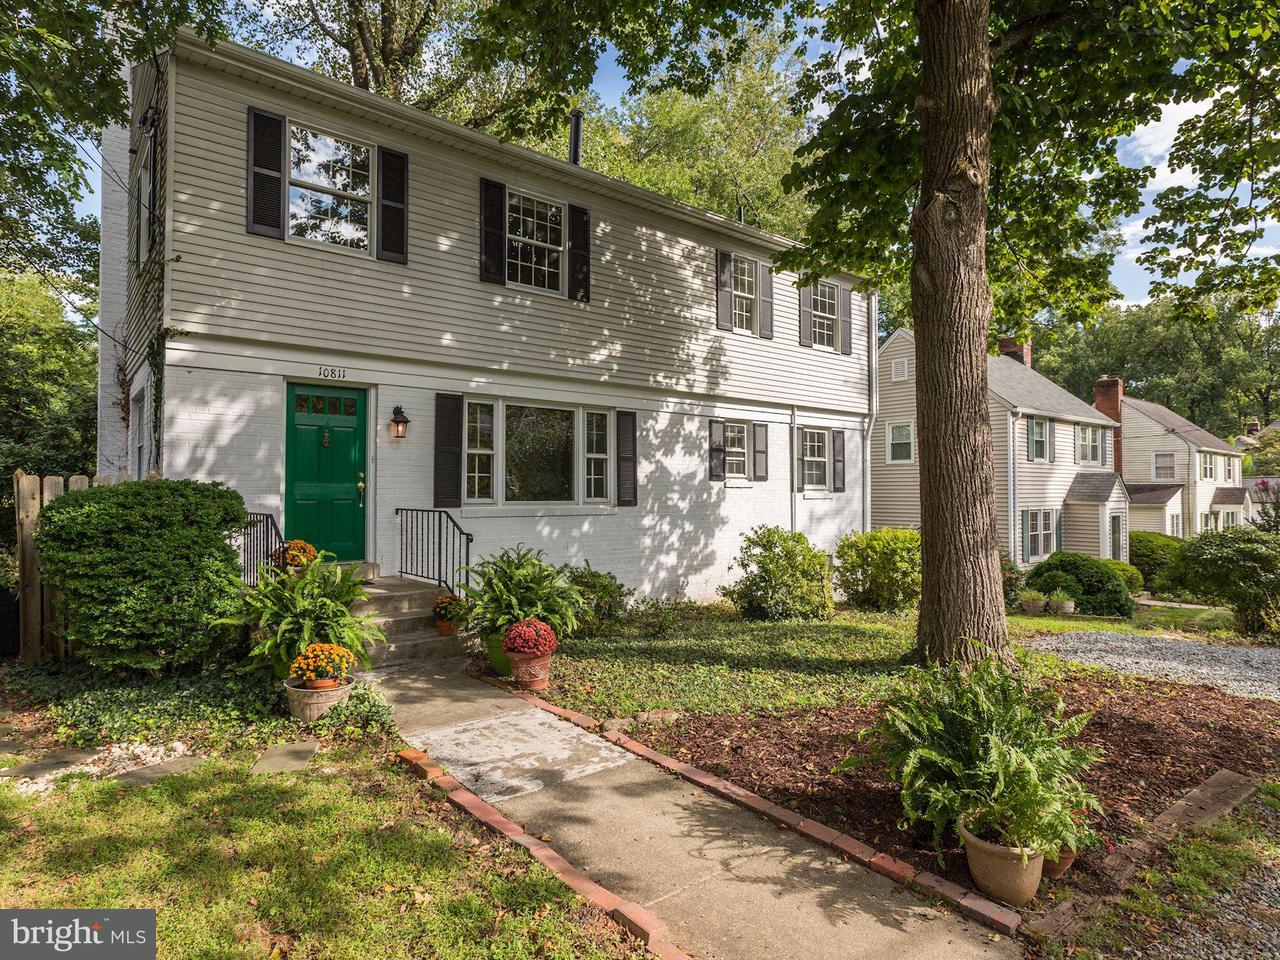 Vivienda unifamiliar por un Venta en 10811 KESWICK Street 10811 KESWICK Street Garrett Park, Maryland 20896 Estados Unidos